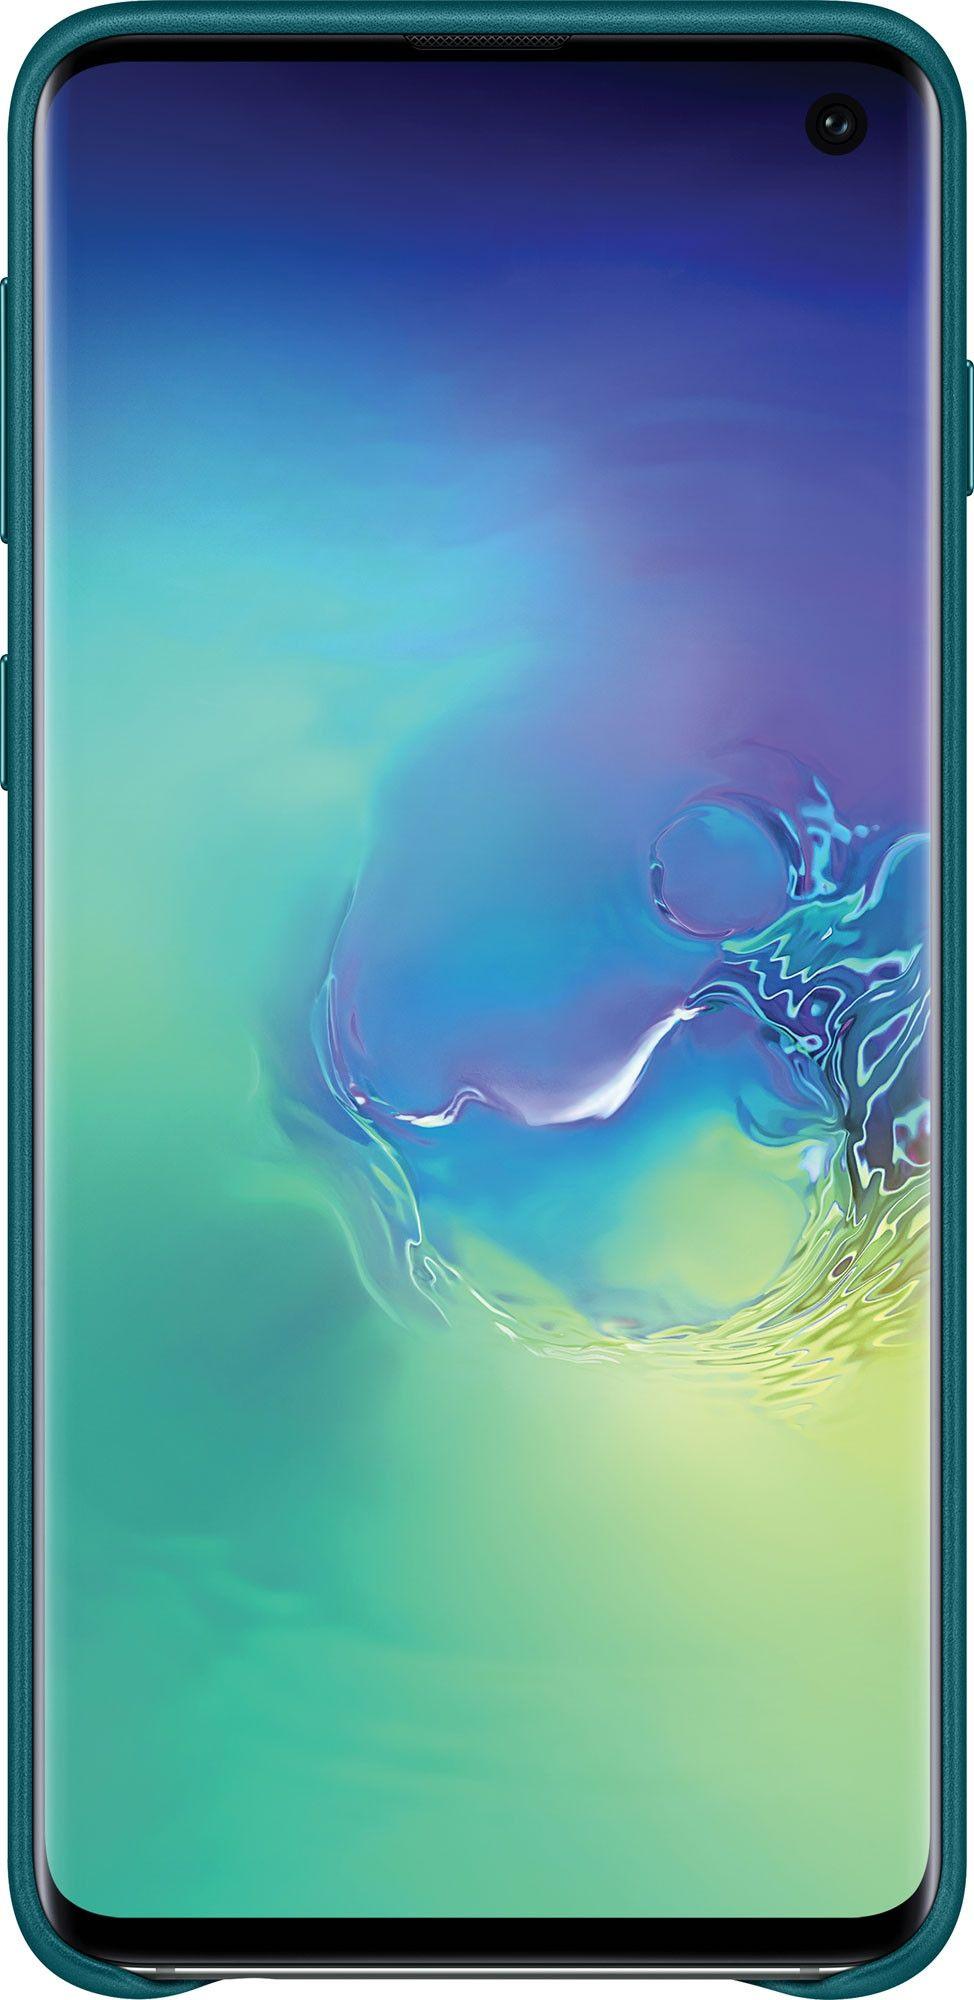 Панель Samsung Leather Cover для Samsung Galaxy S10 (EF-VG973LGEGRU) Green от Територія твоєї техніки - 3